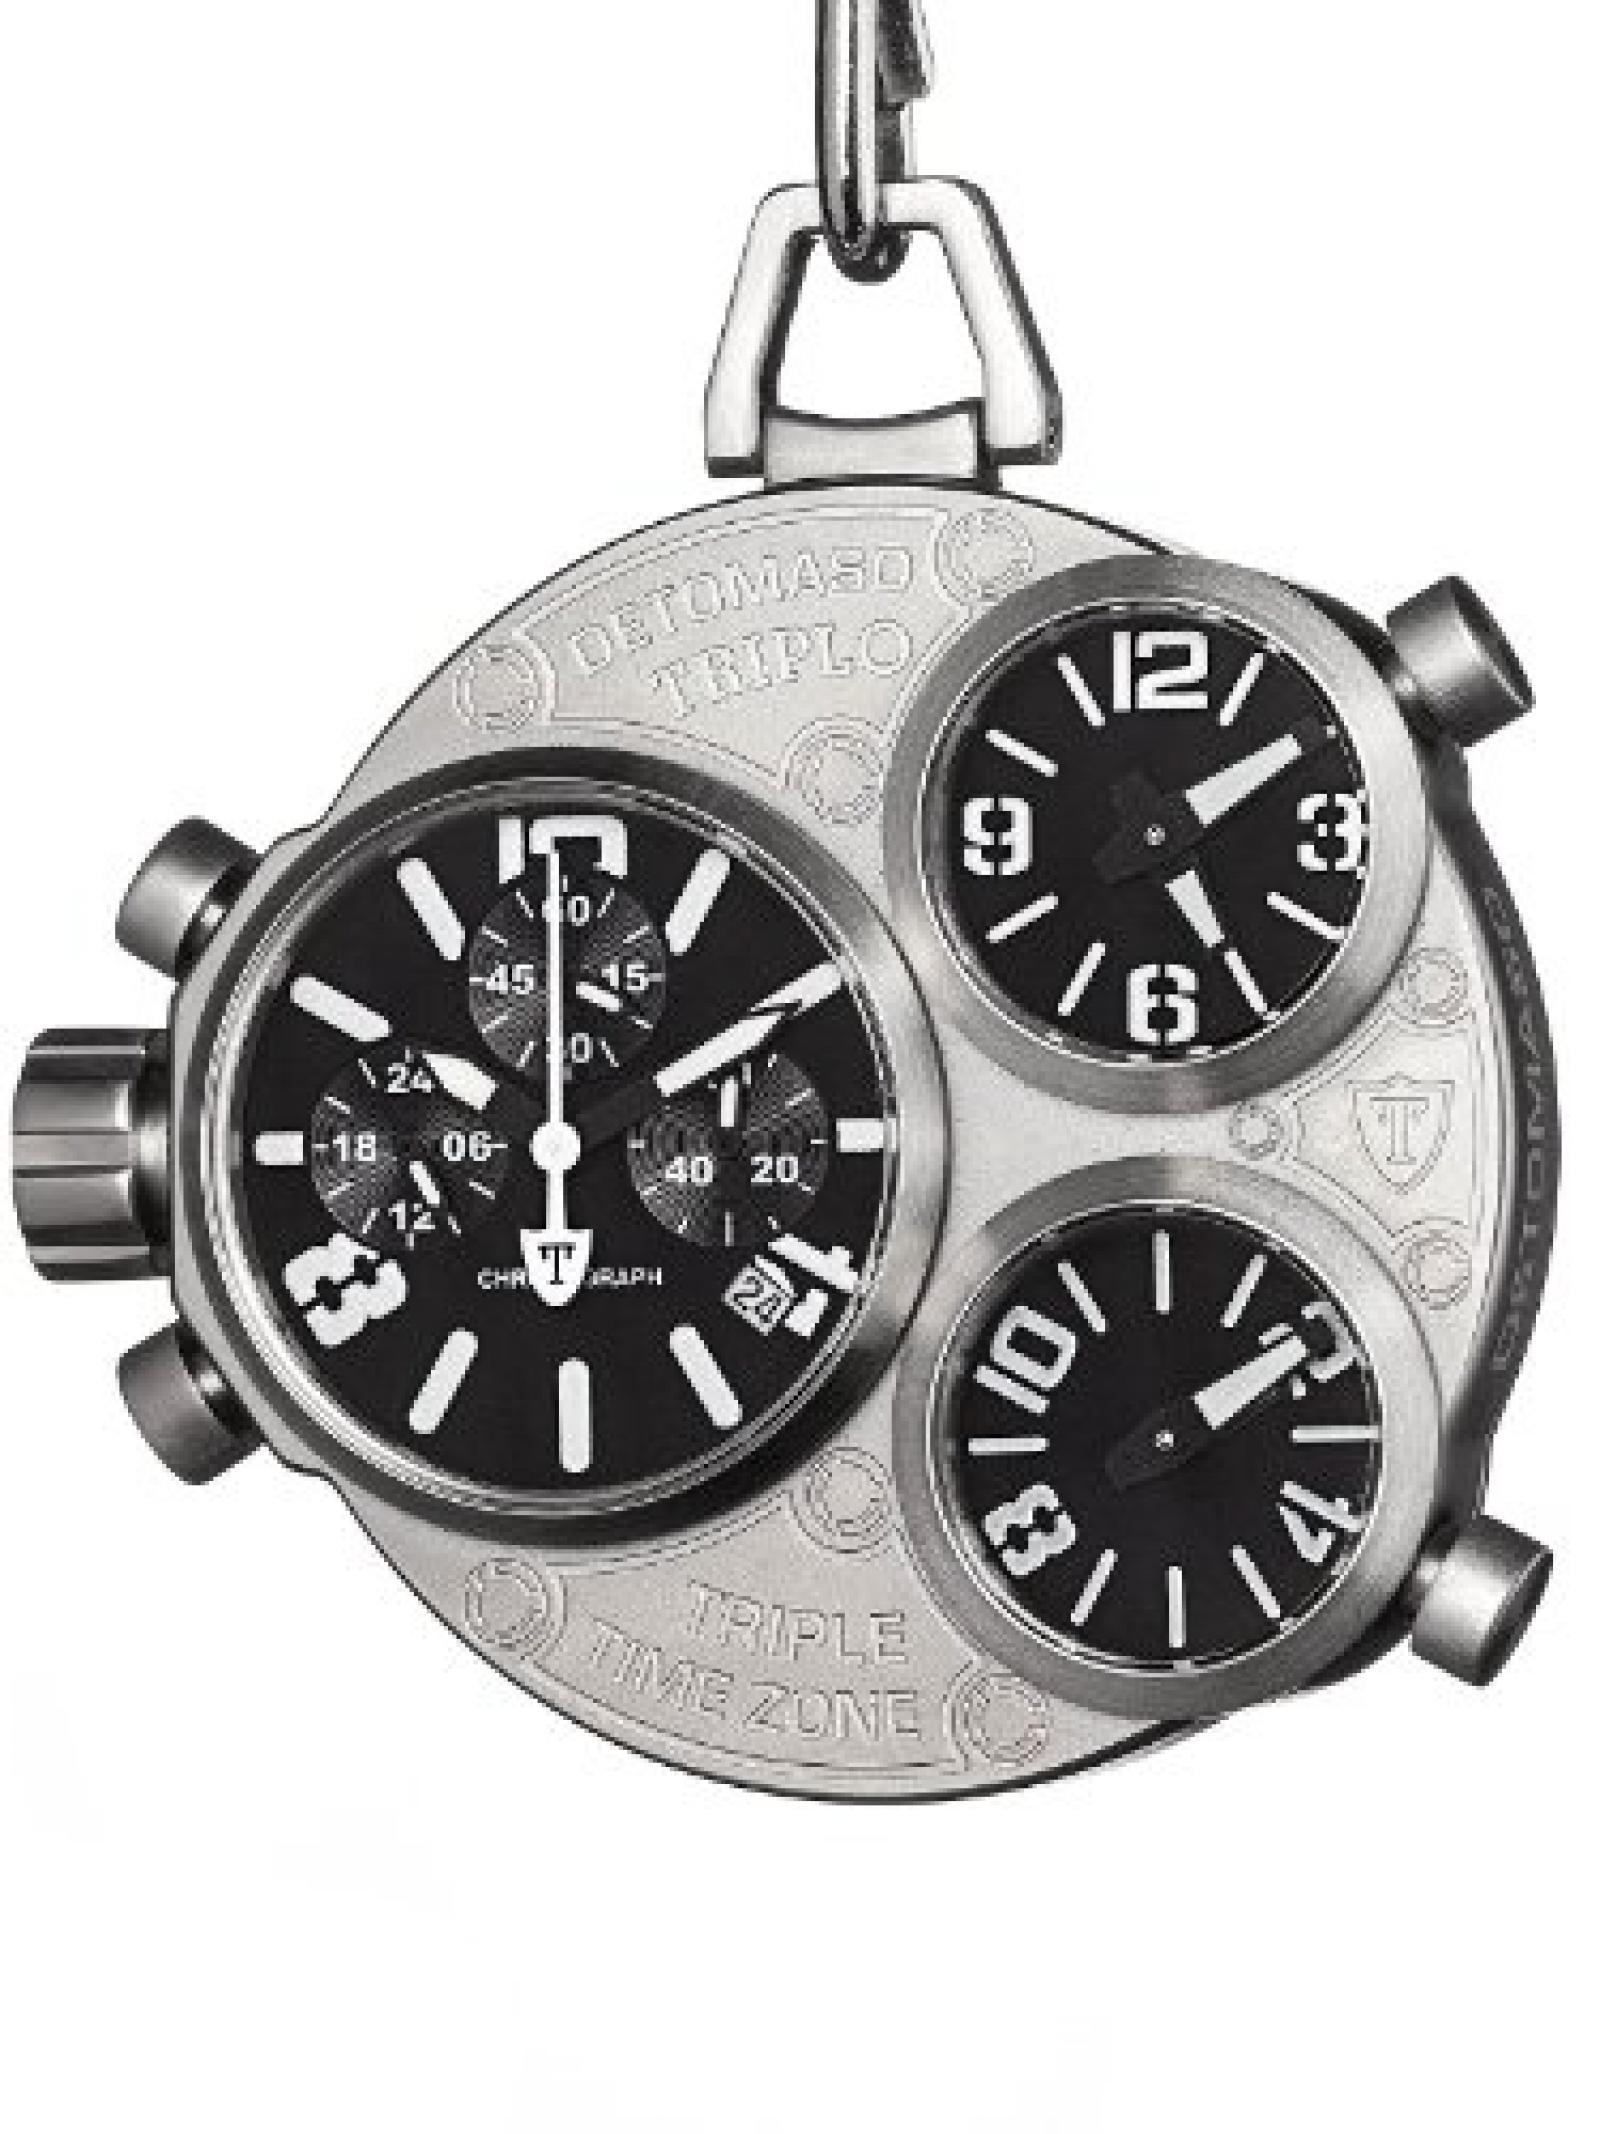 Detomaso Herren-Armbanduhr XL TRIPLO POCKET Taschenuhr Silver Chronograph Quarz DT2038-D